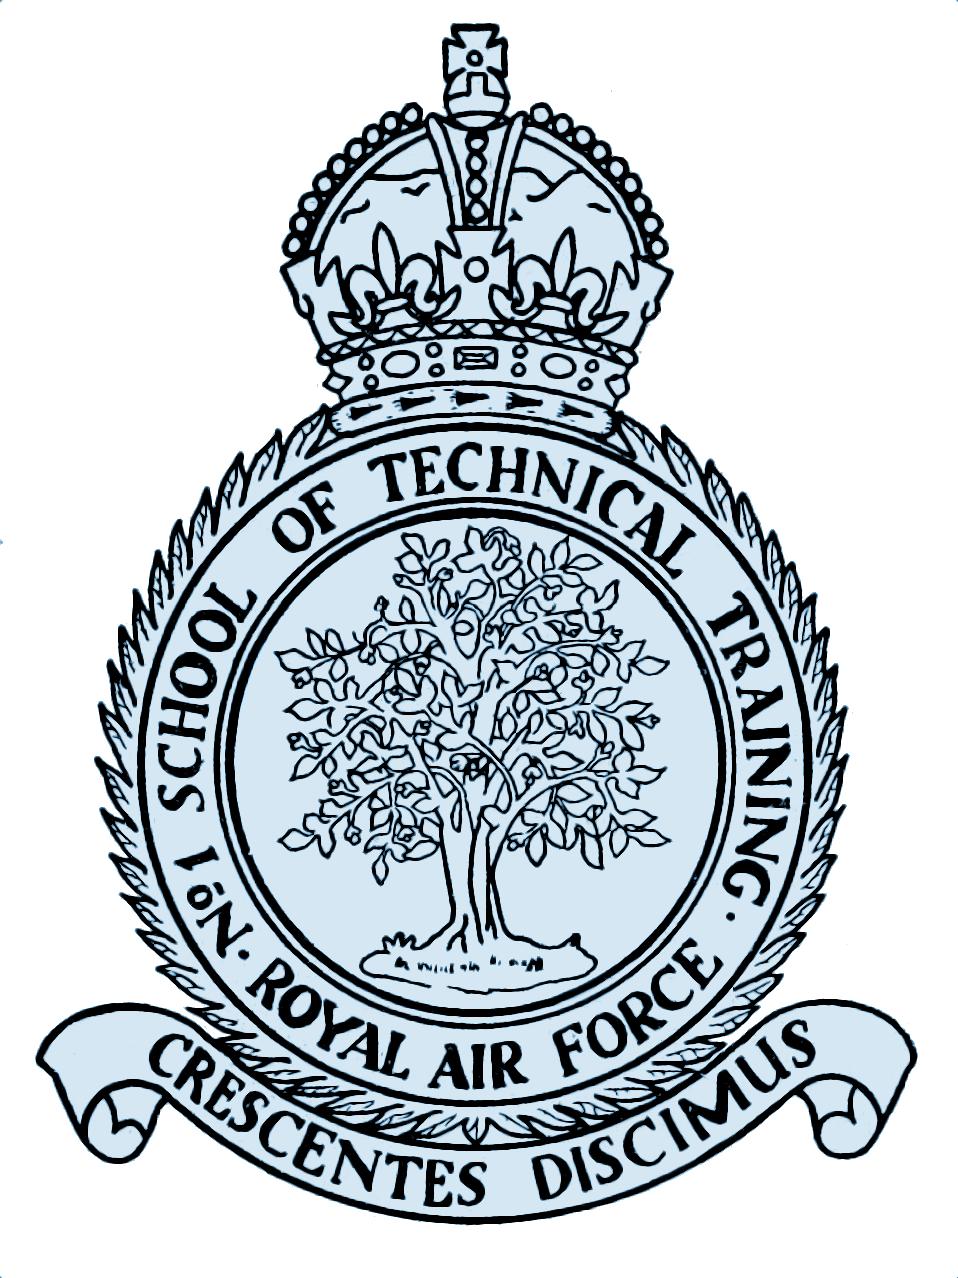 The Halton School crest